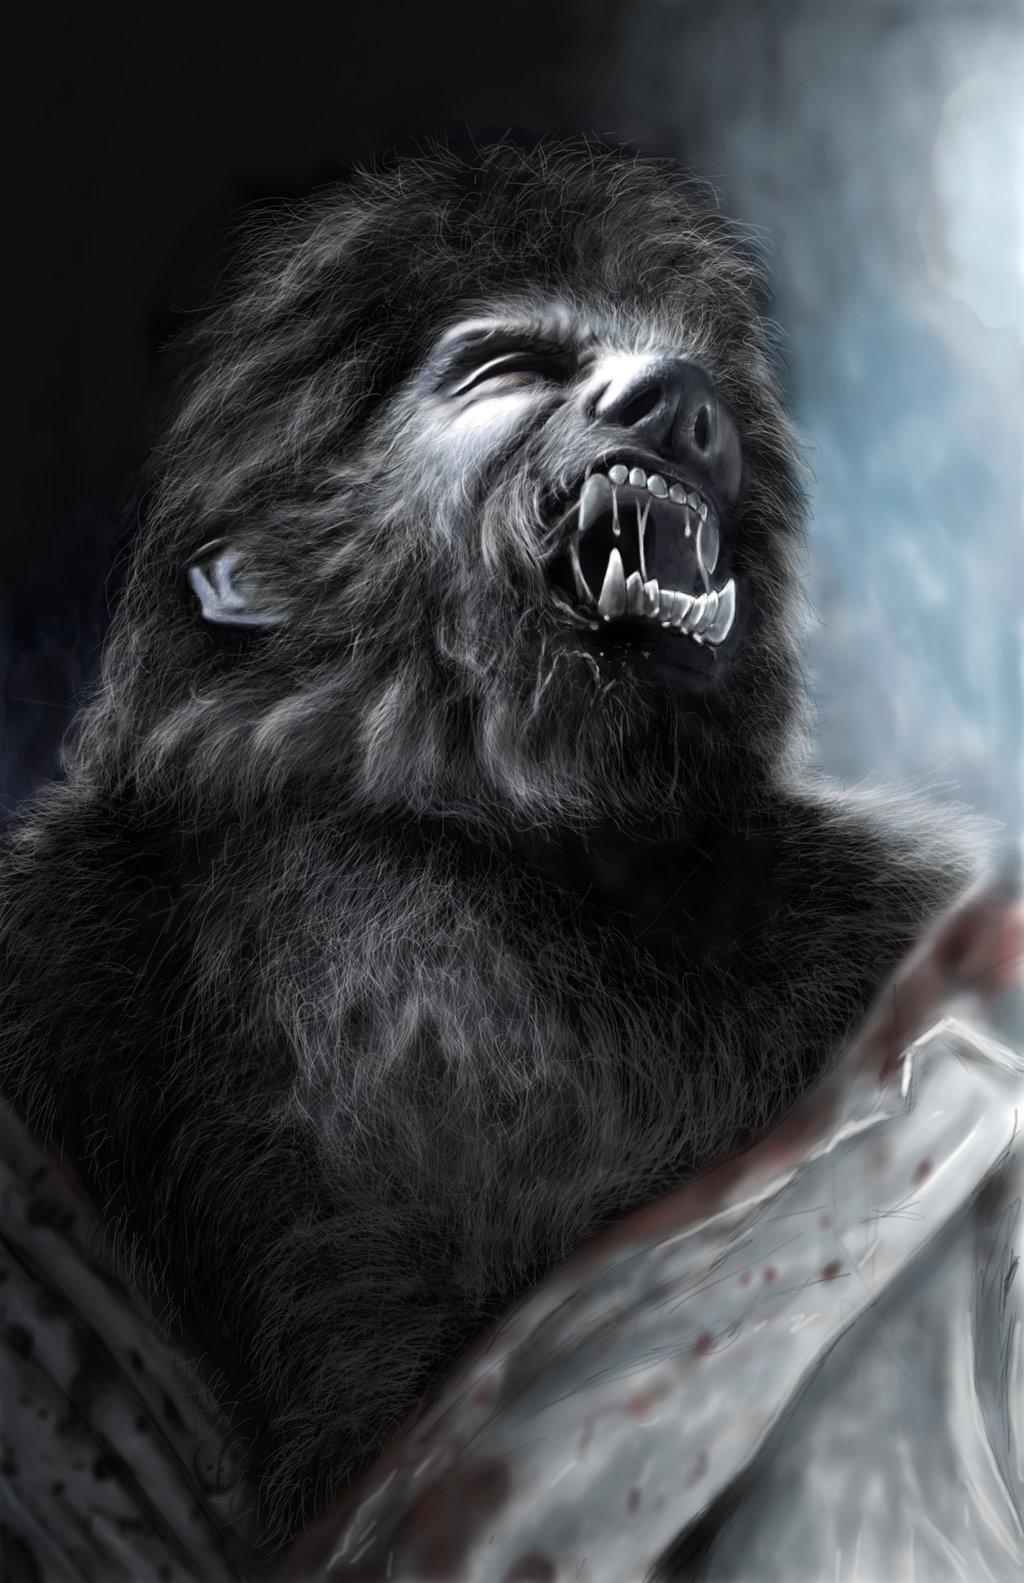 Drawn wolfman west virginia  com 2013 deviantart @deviantART